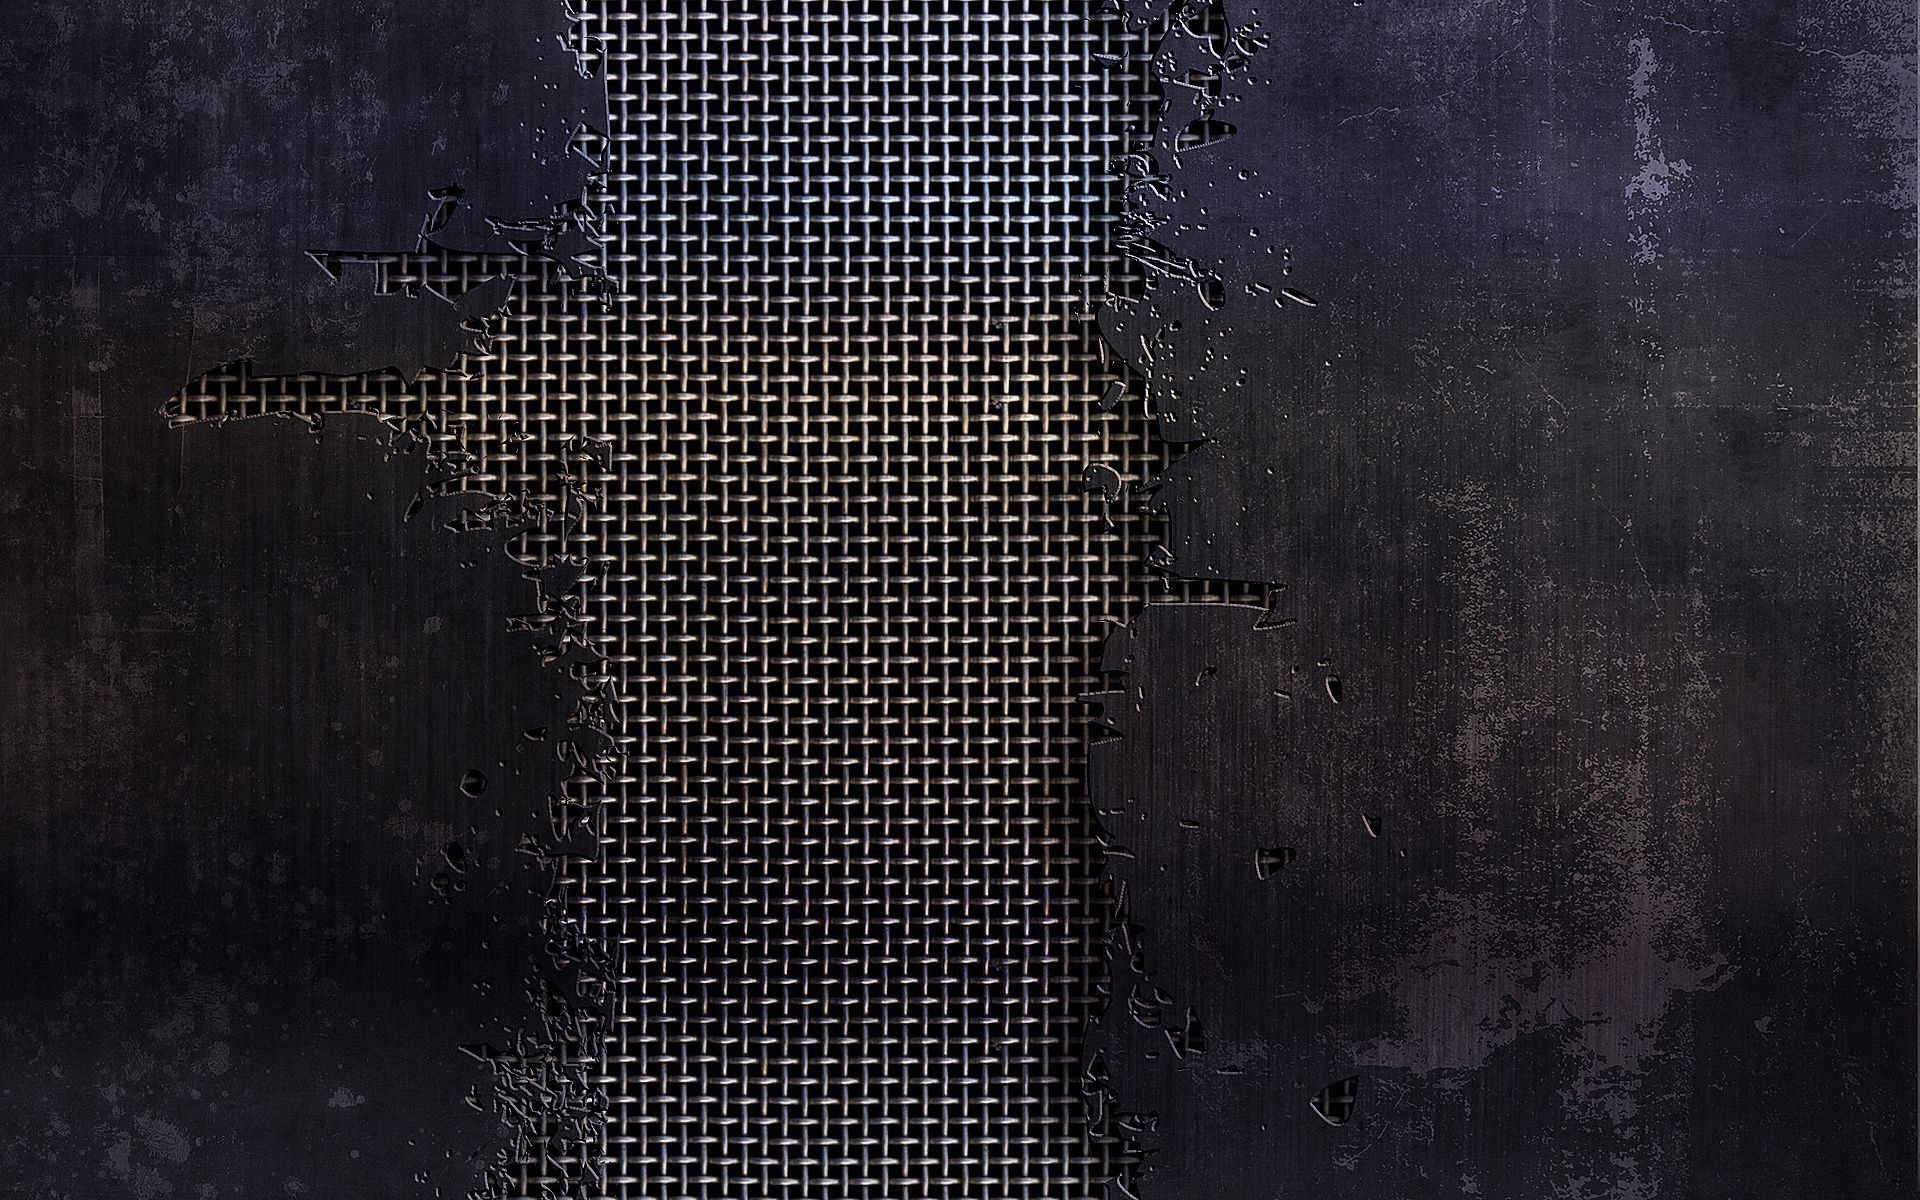 General 1920x1200 wireframe black texture